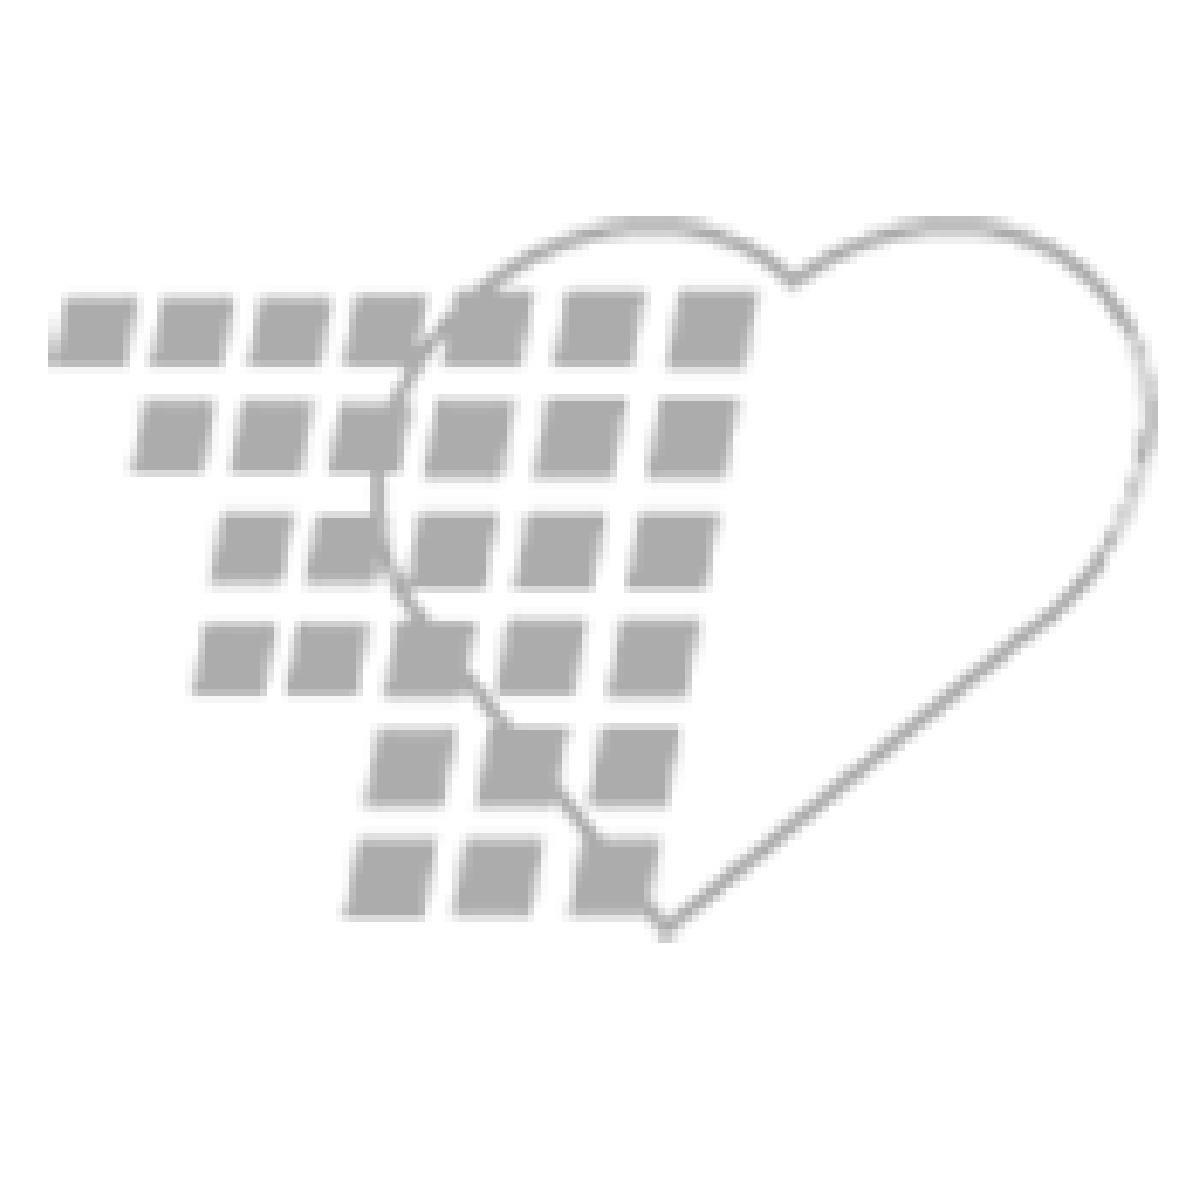 06-93-9020 - Demo Dose® Inderl 1mL Ampule 1mg/ mL